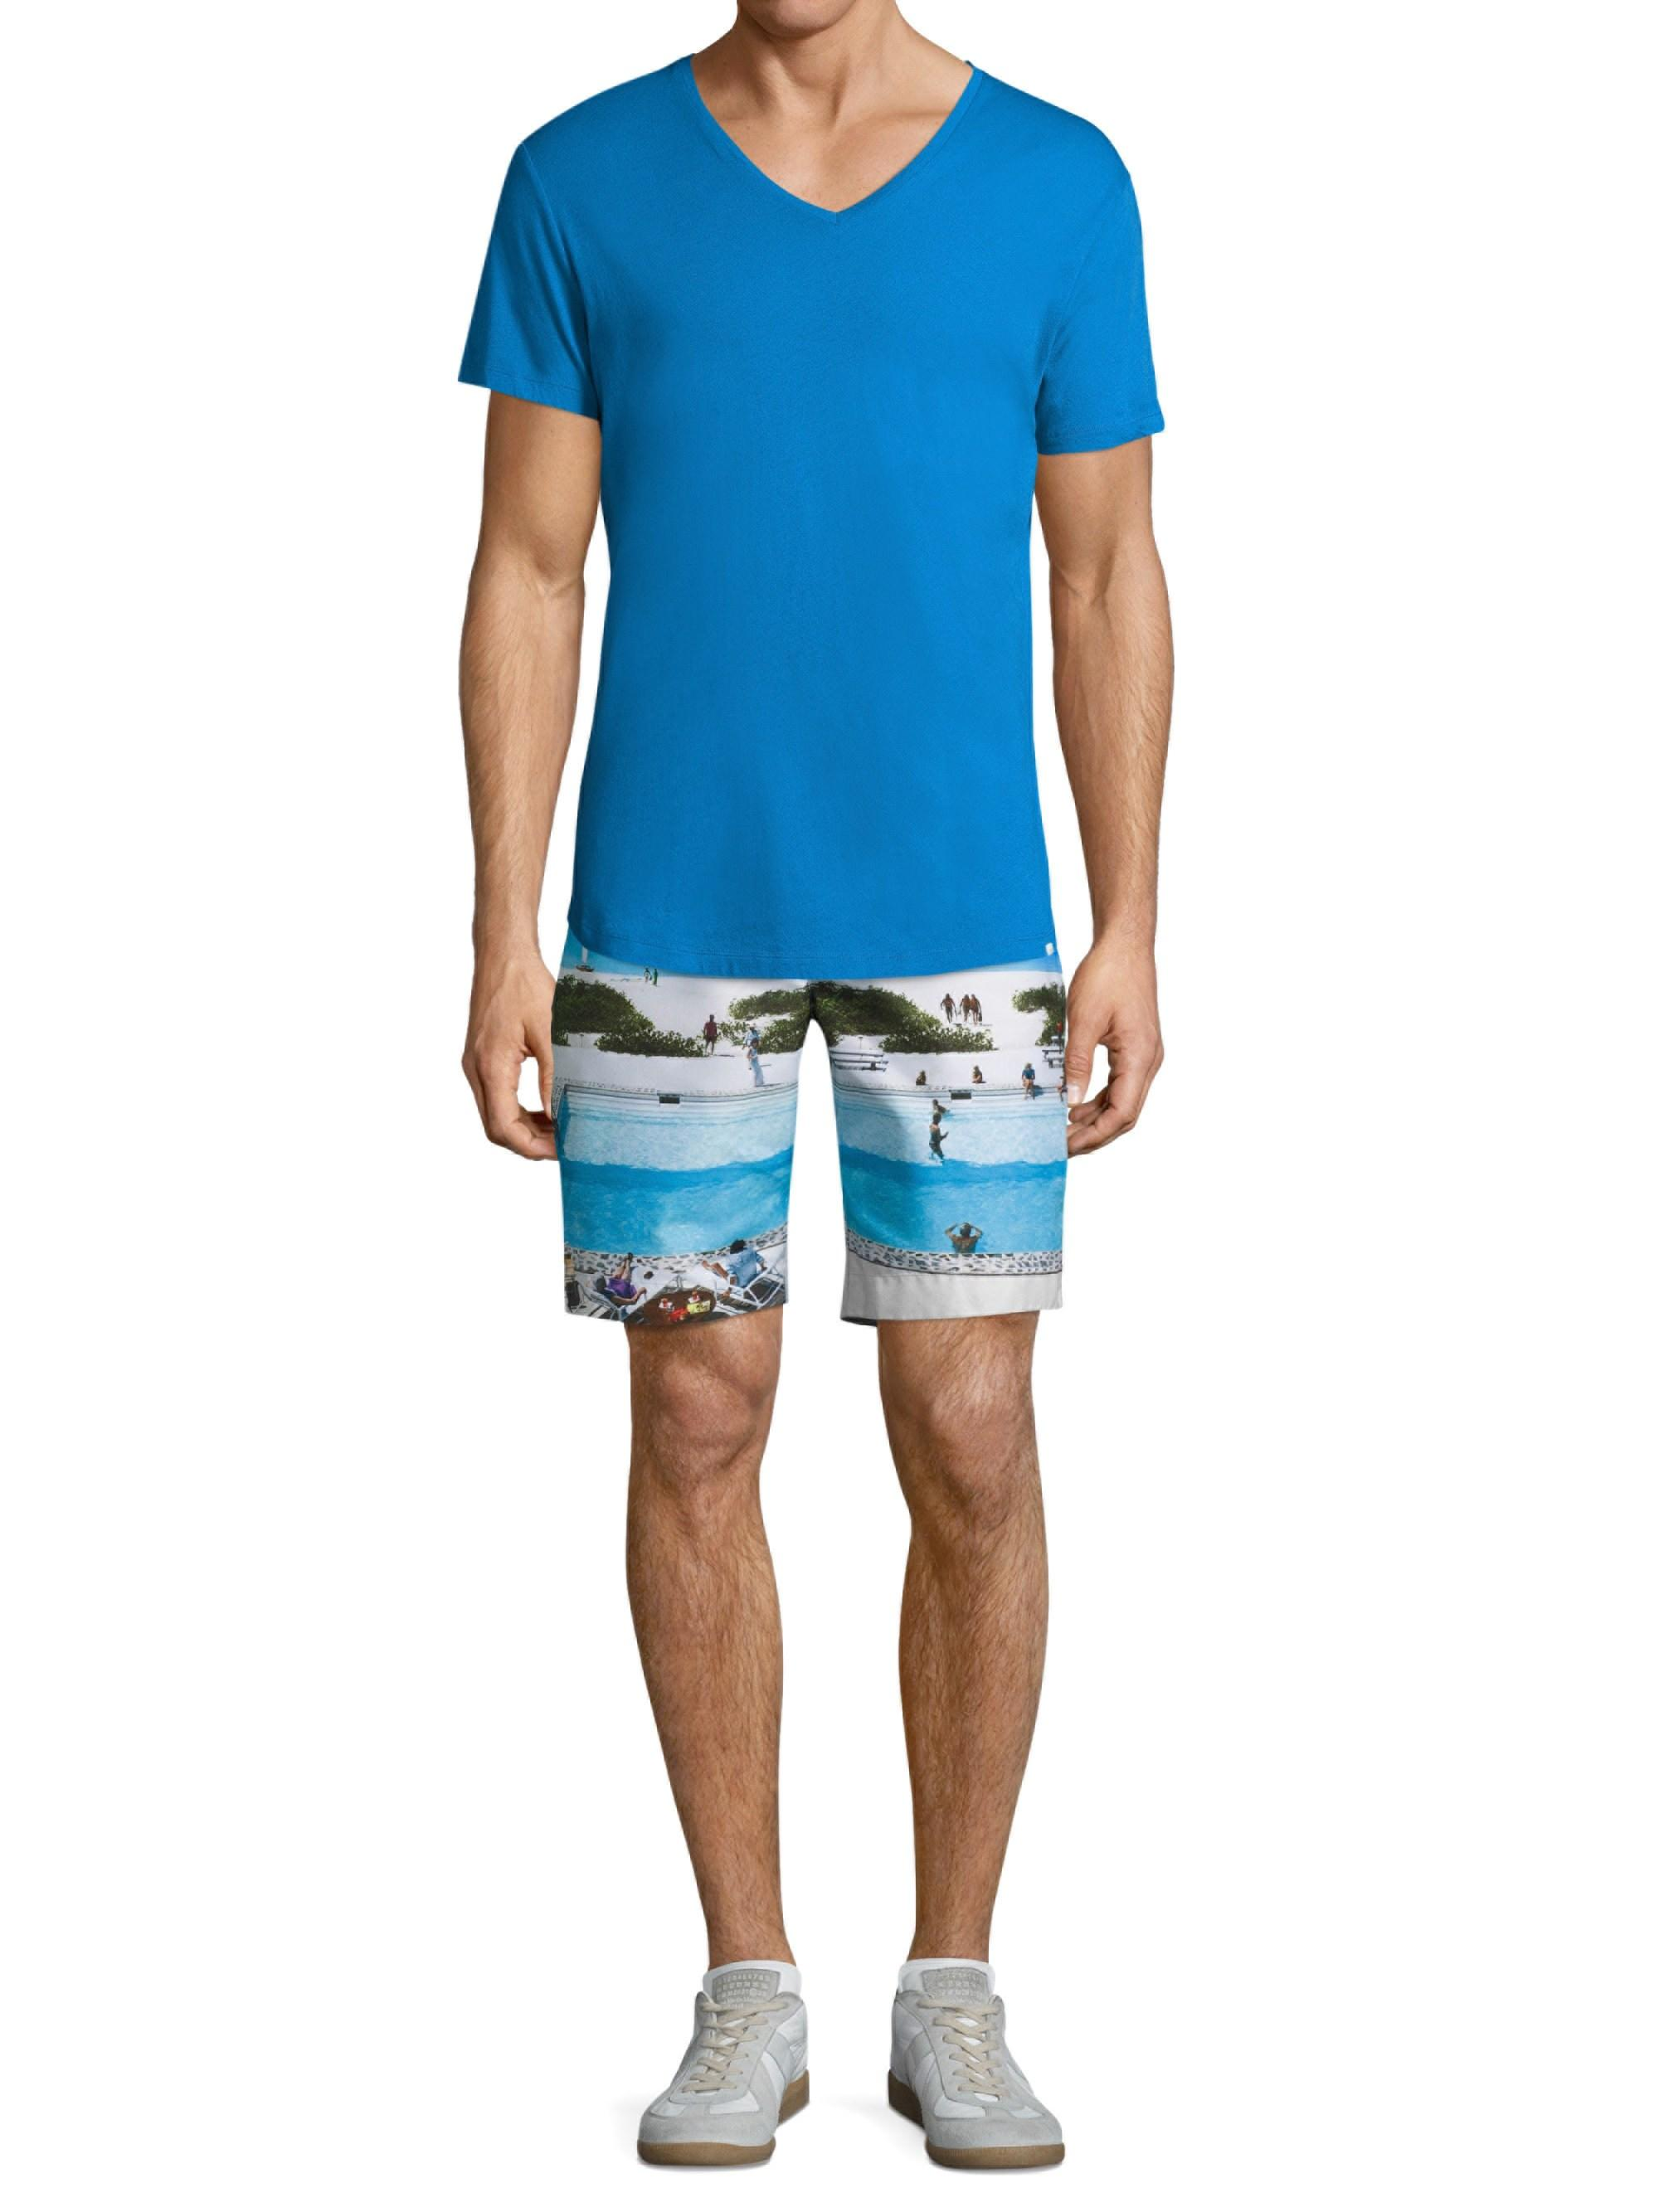 04c318a2cf Orlebar Brown Men's Dane Ii Pine Va-cay Longest-length Swim Trunks ...